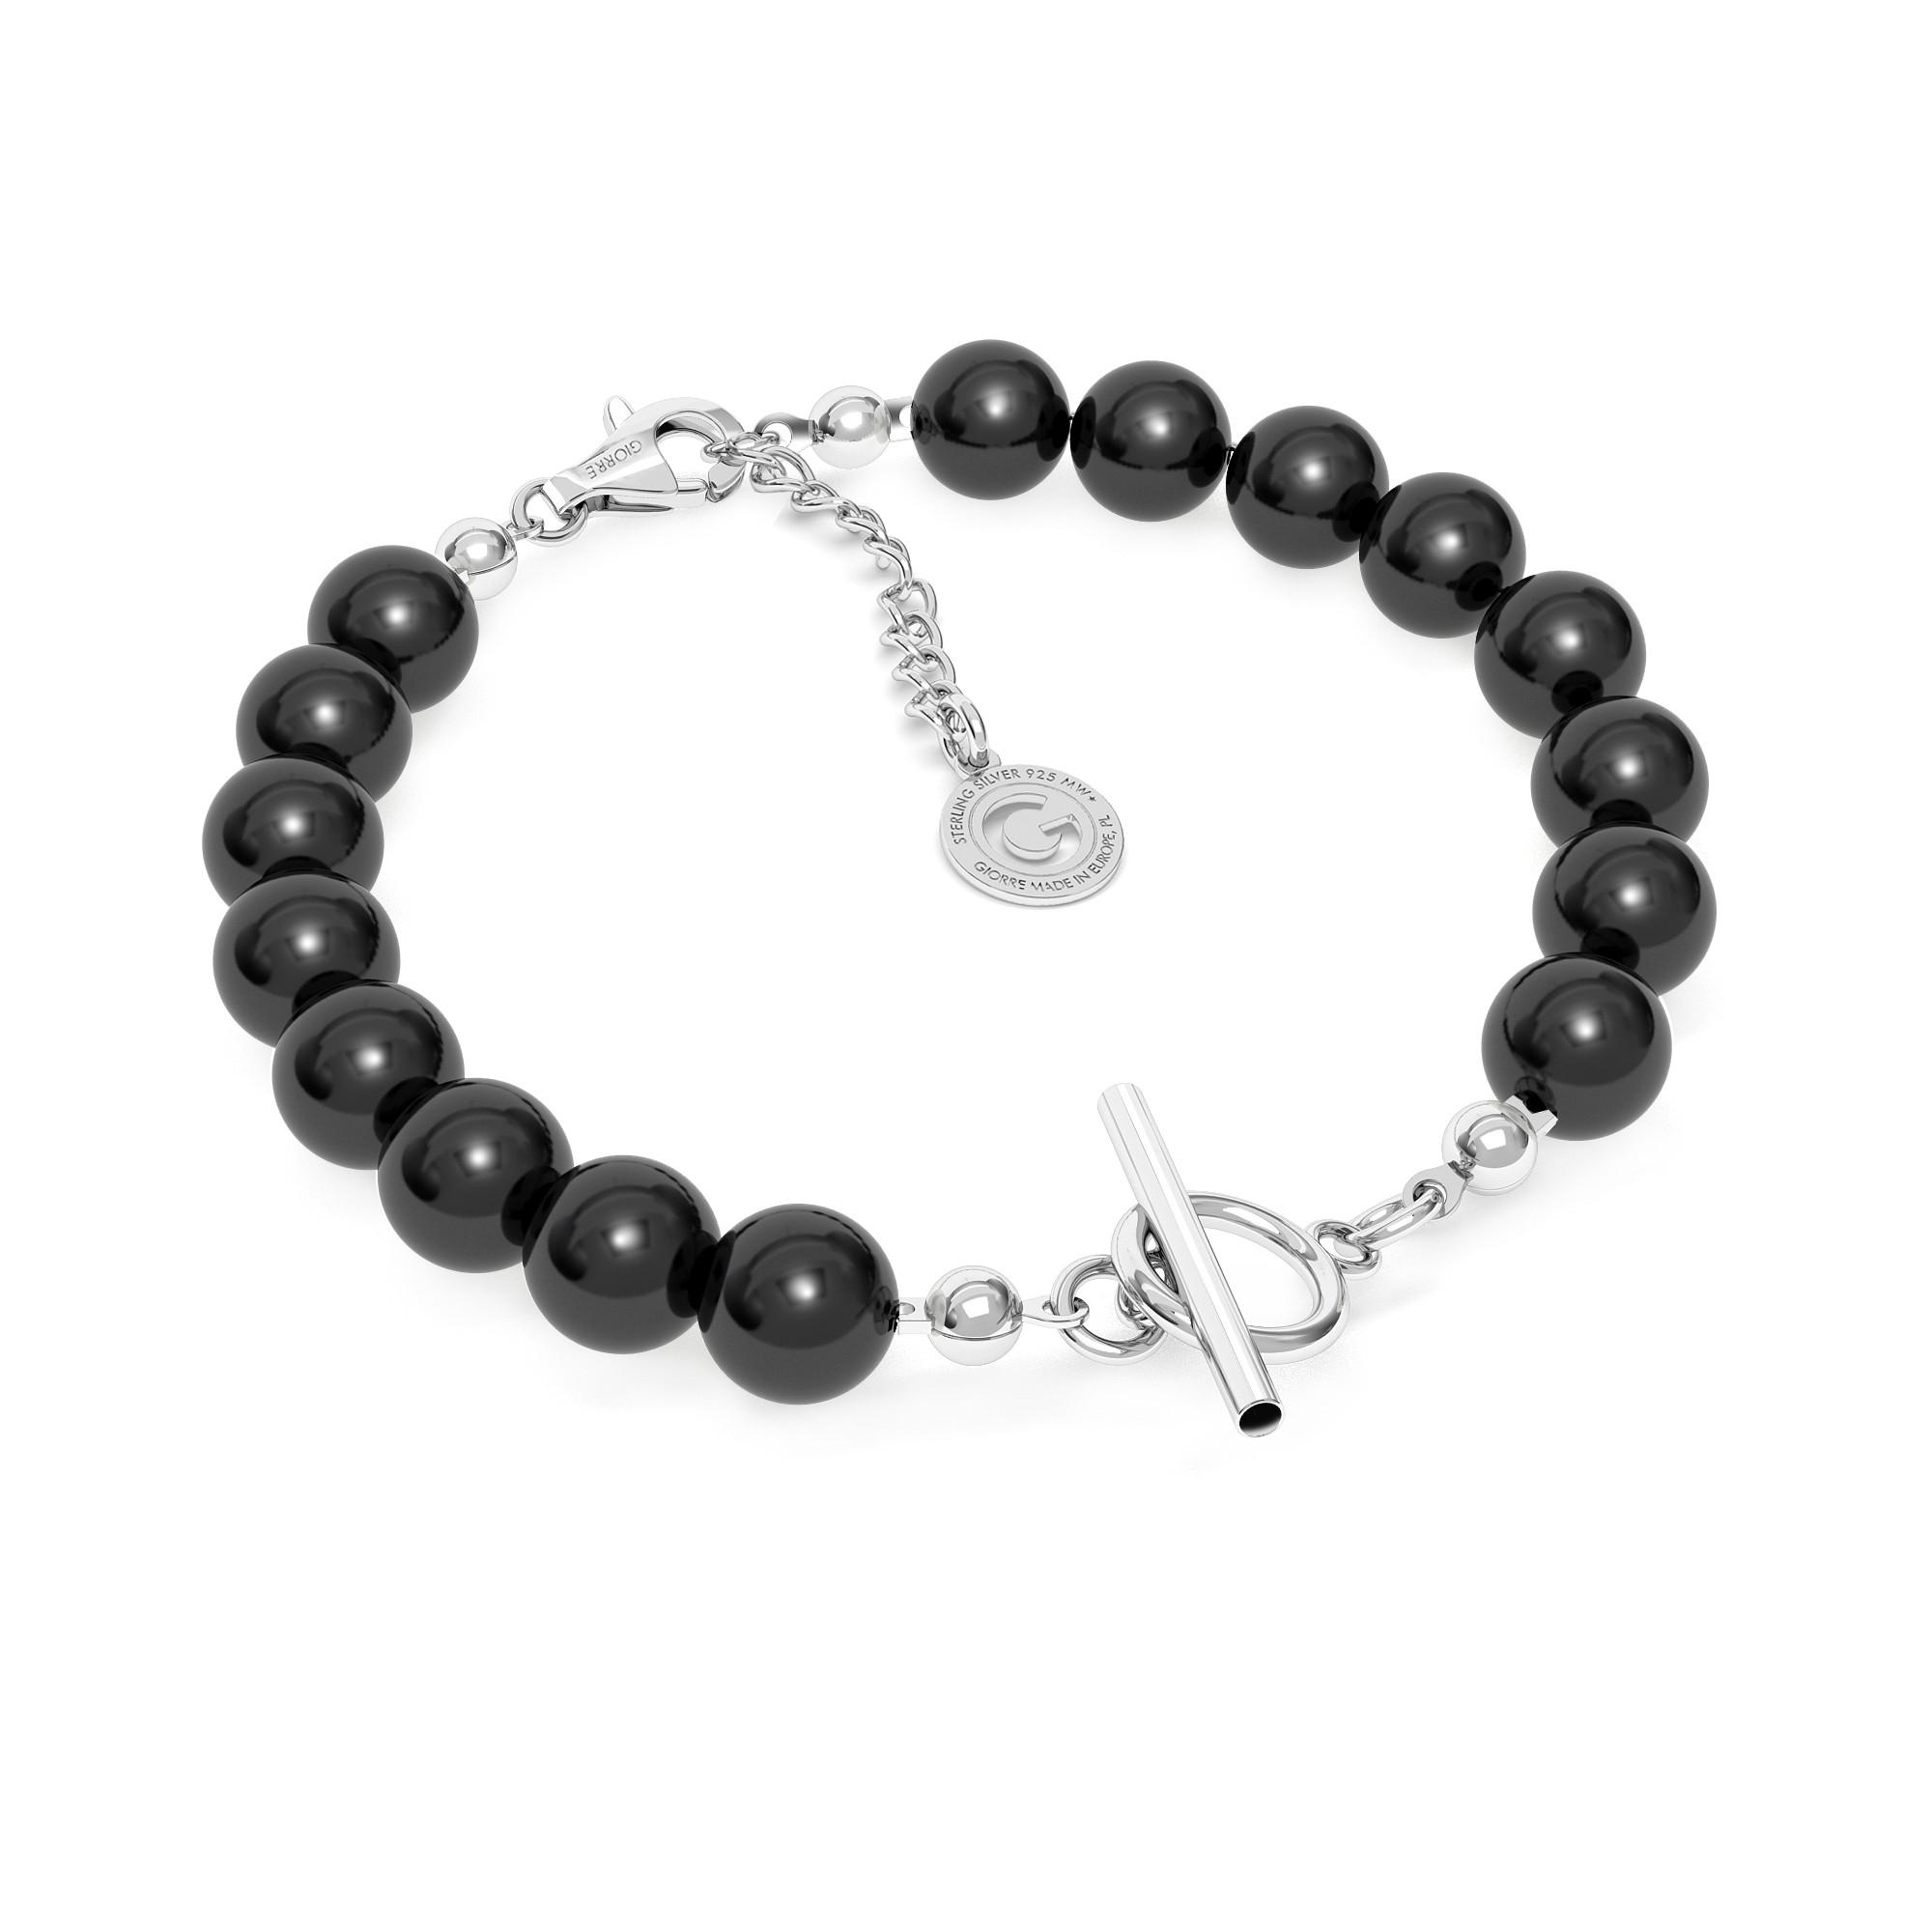 Perlen armband sterling silber 925